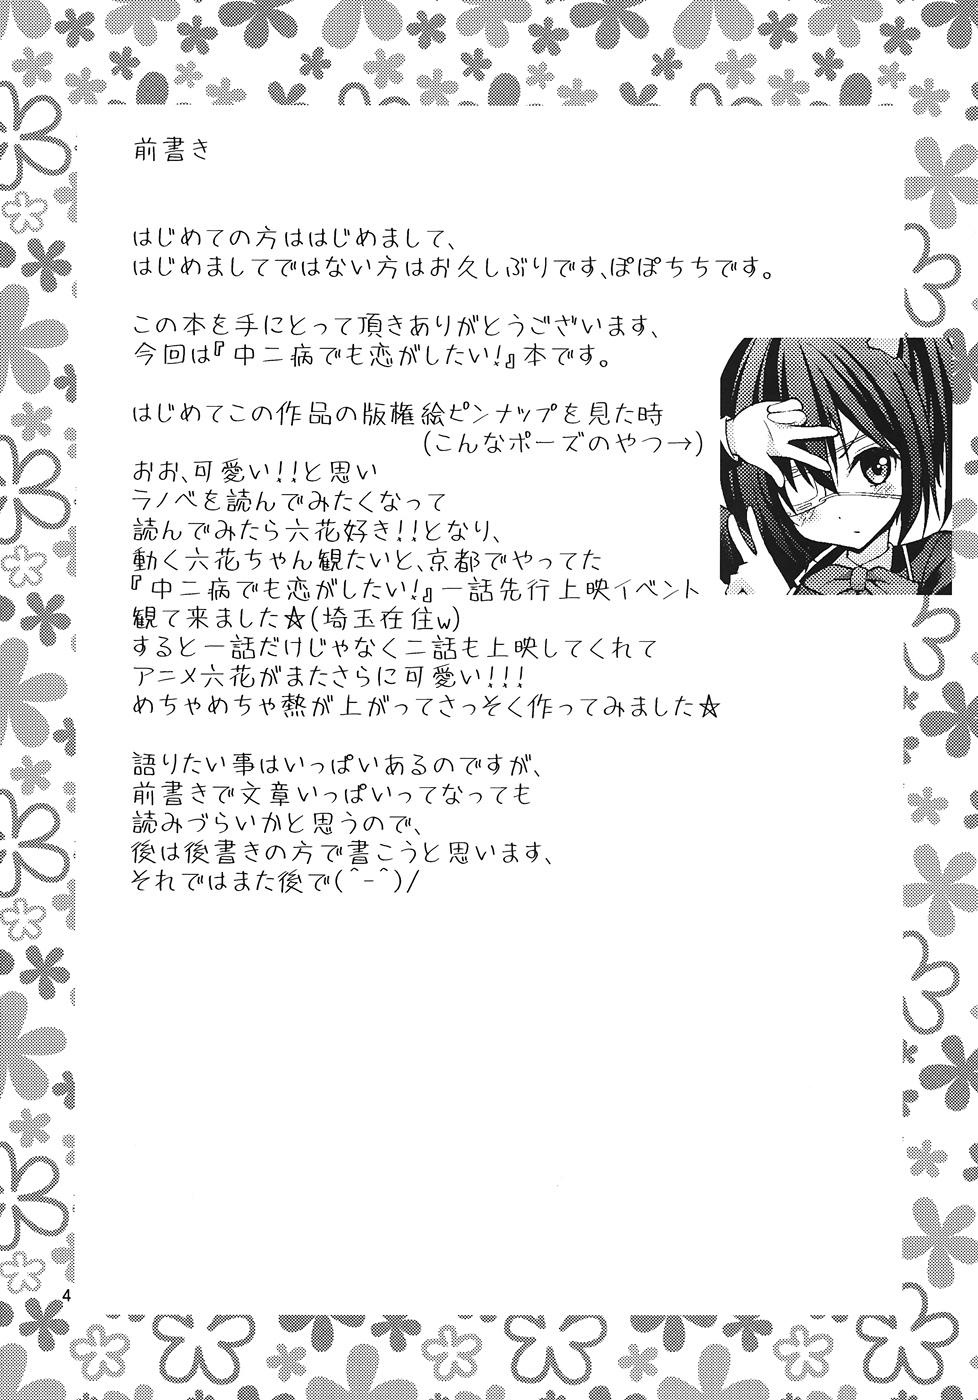 Hình ảnh  in Chuunibyou Demo H ga Shitai